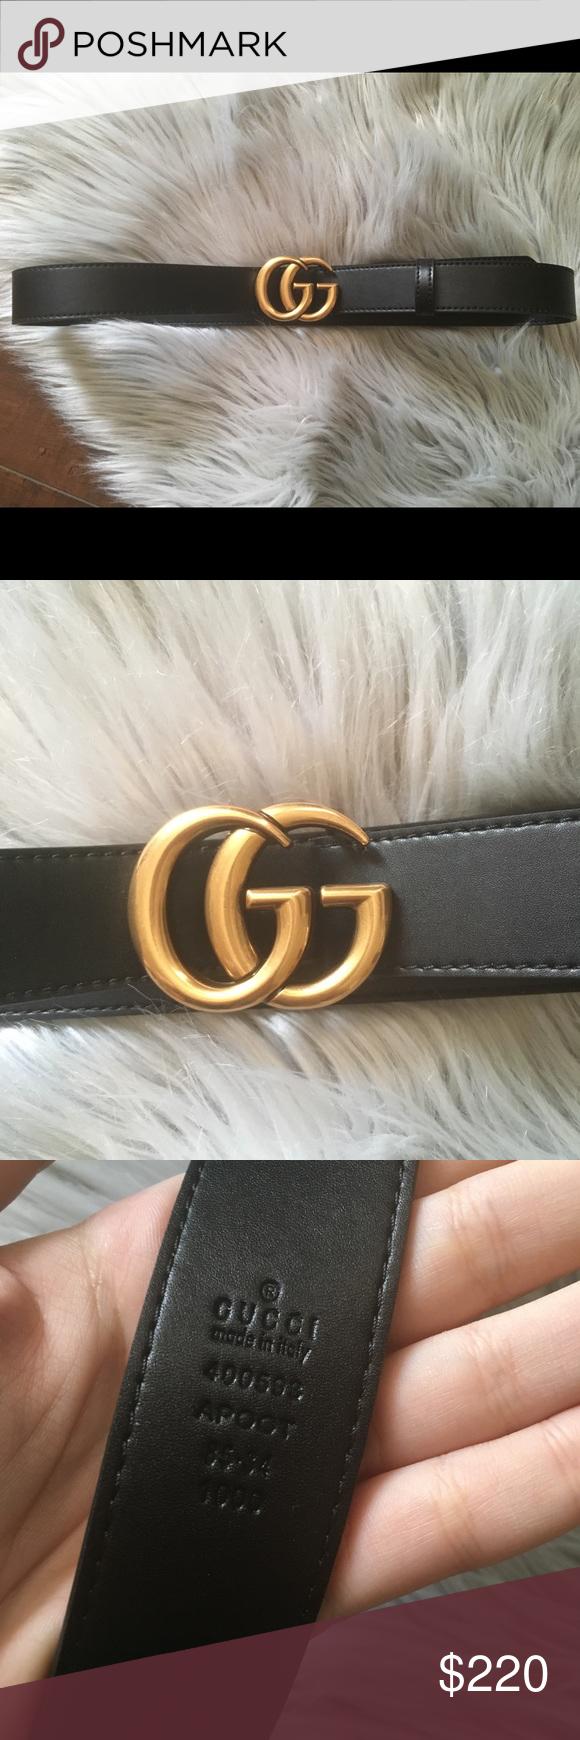 e9f262ec70d Gucci Marmont Belt Women